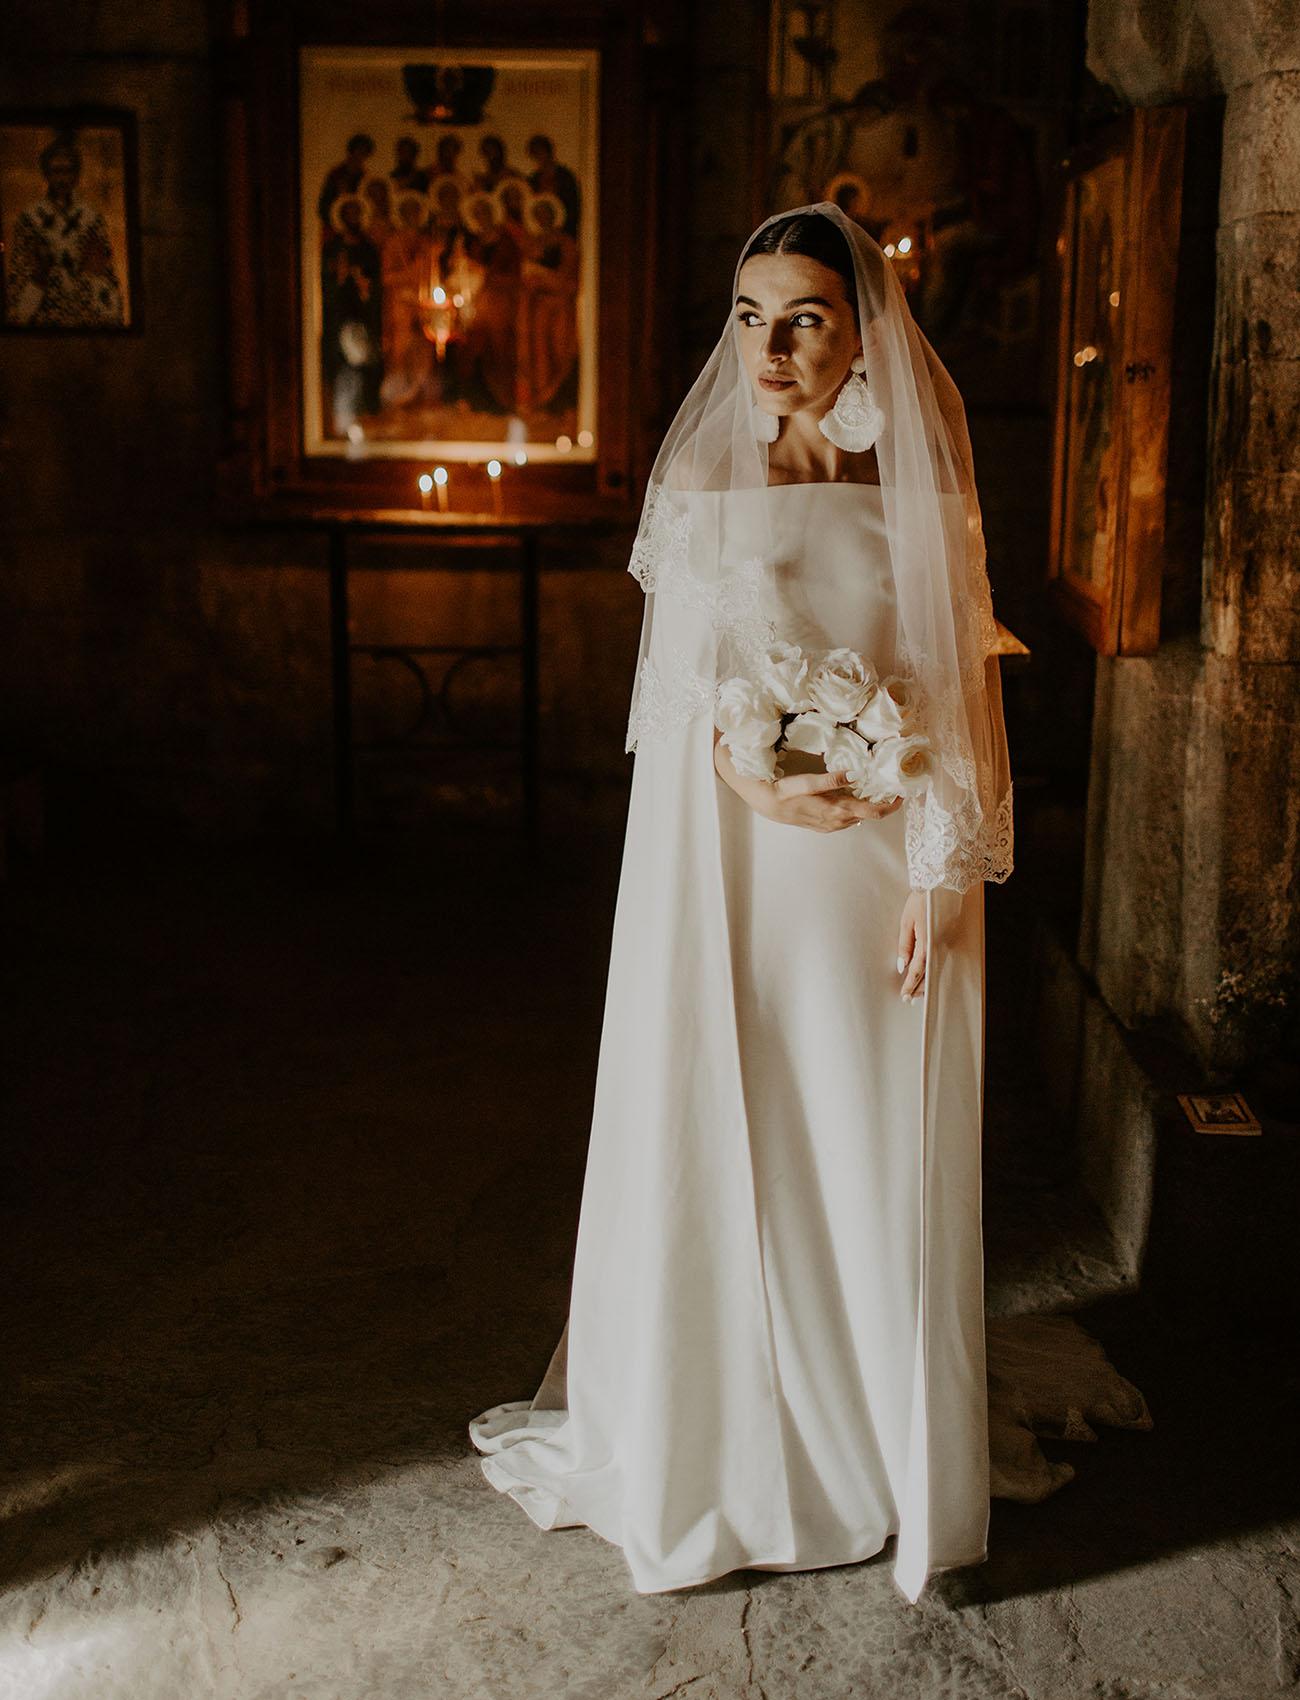 Khatia in bespoke wedding gown